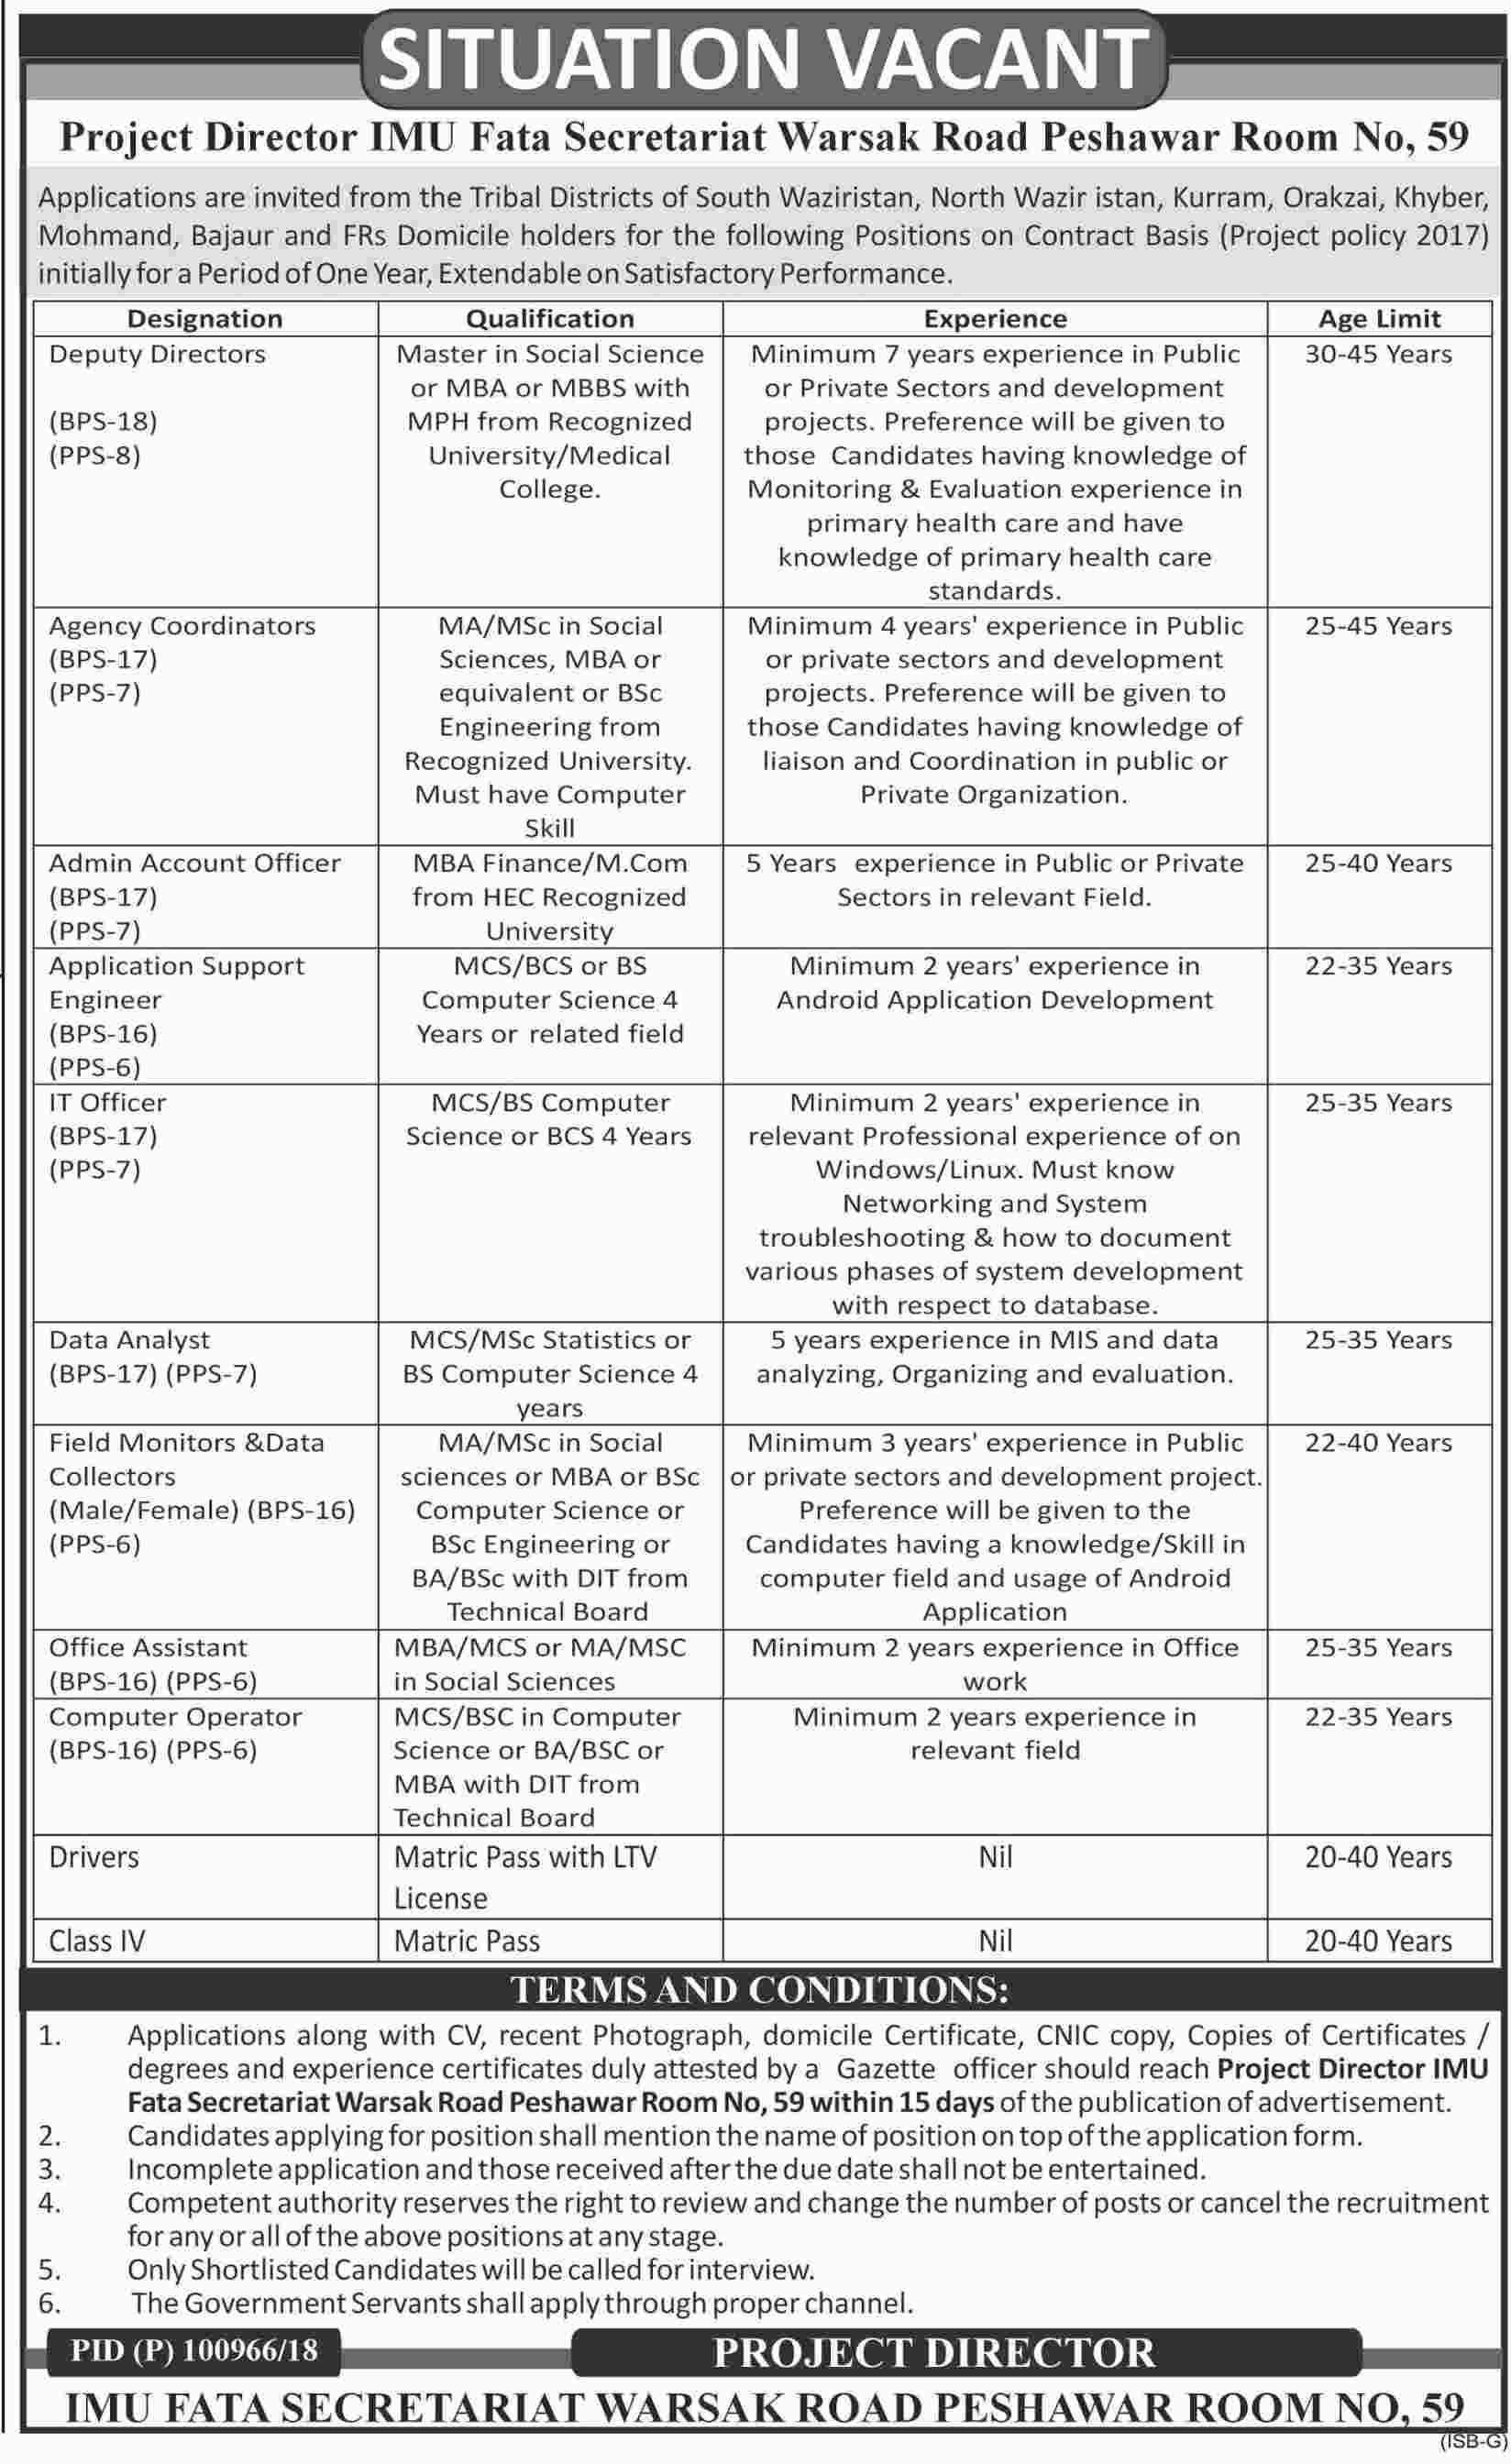 Project Director IMU Fata Secretariat Latest Jobs 2018 -thumbnail